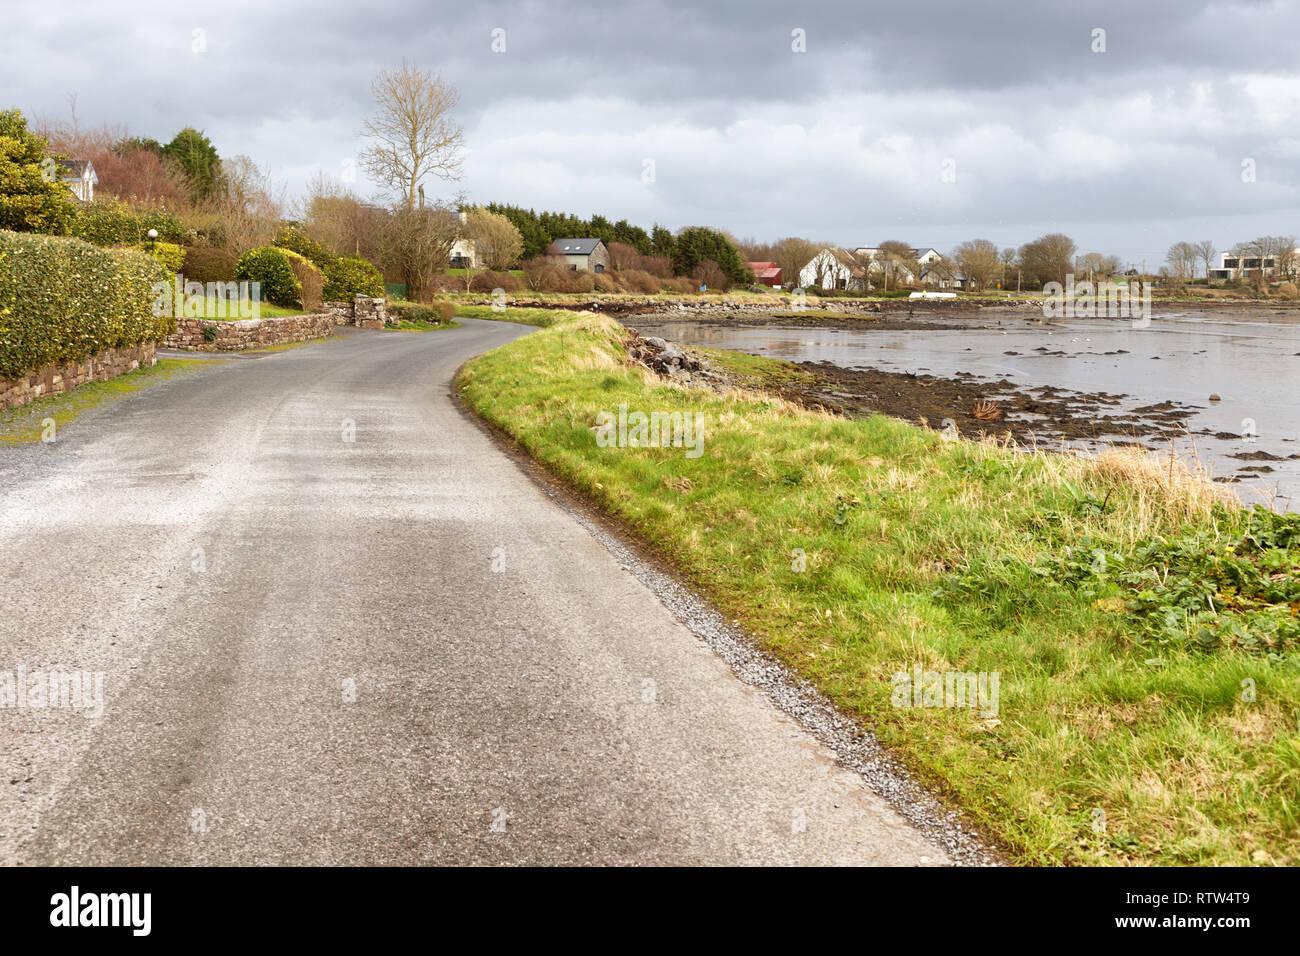 Top Things to Do in Oranmore, Ireland - TripAdvisor